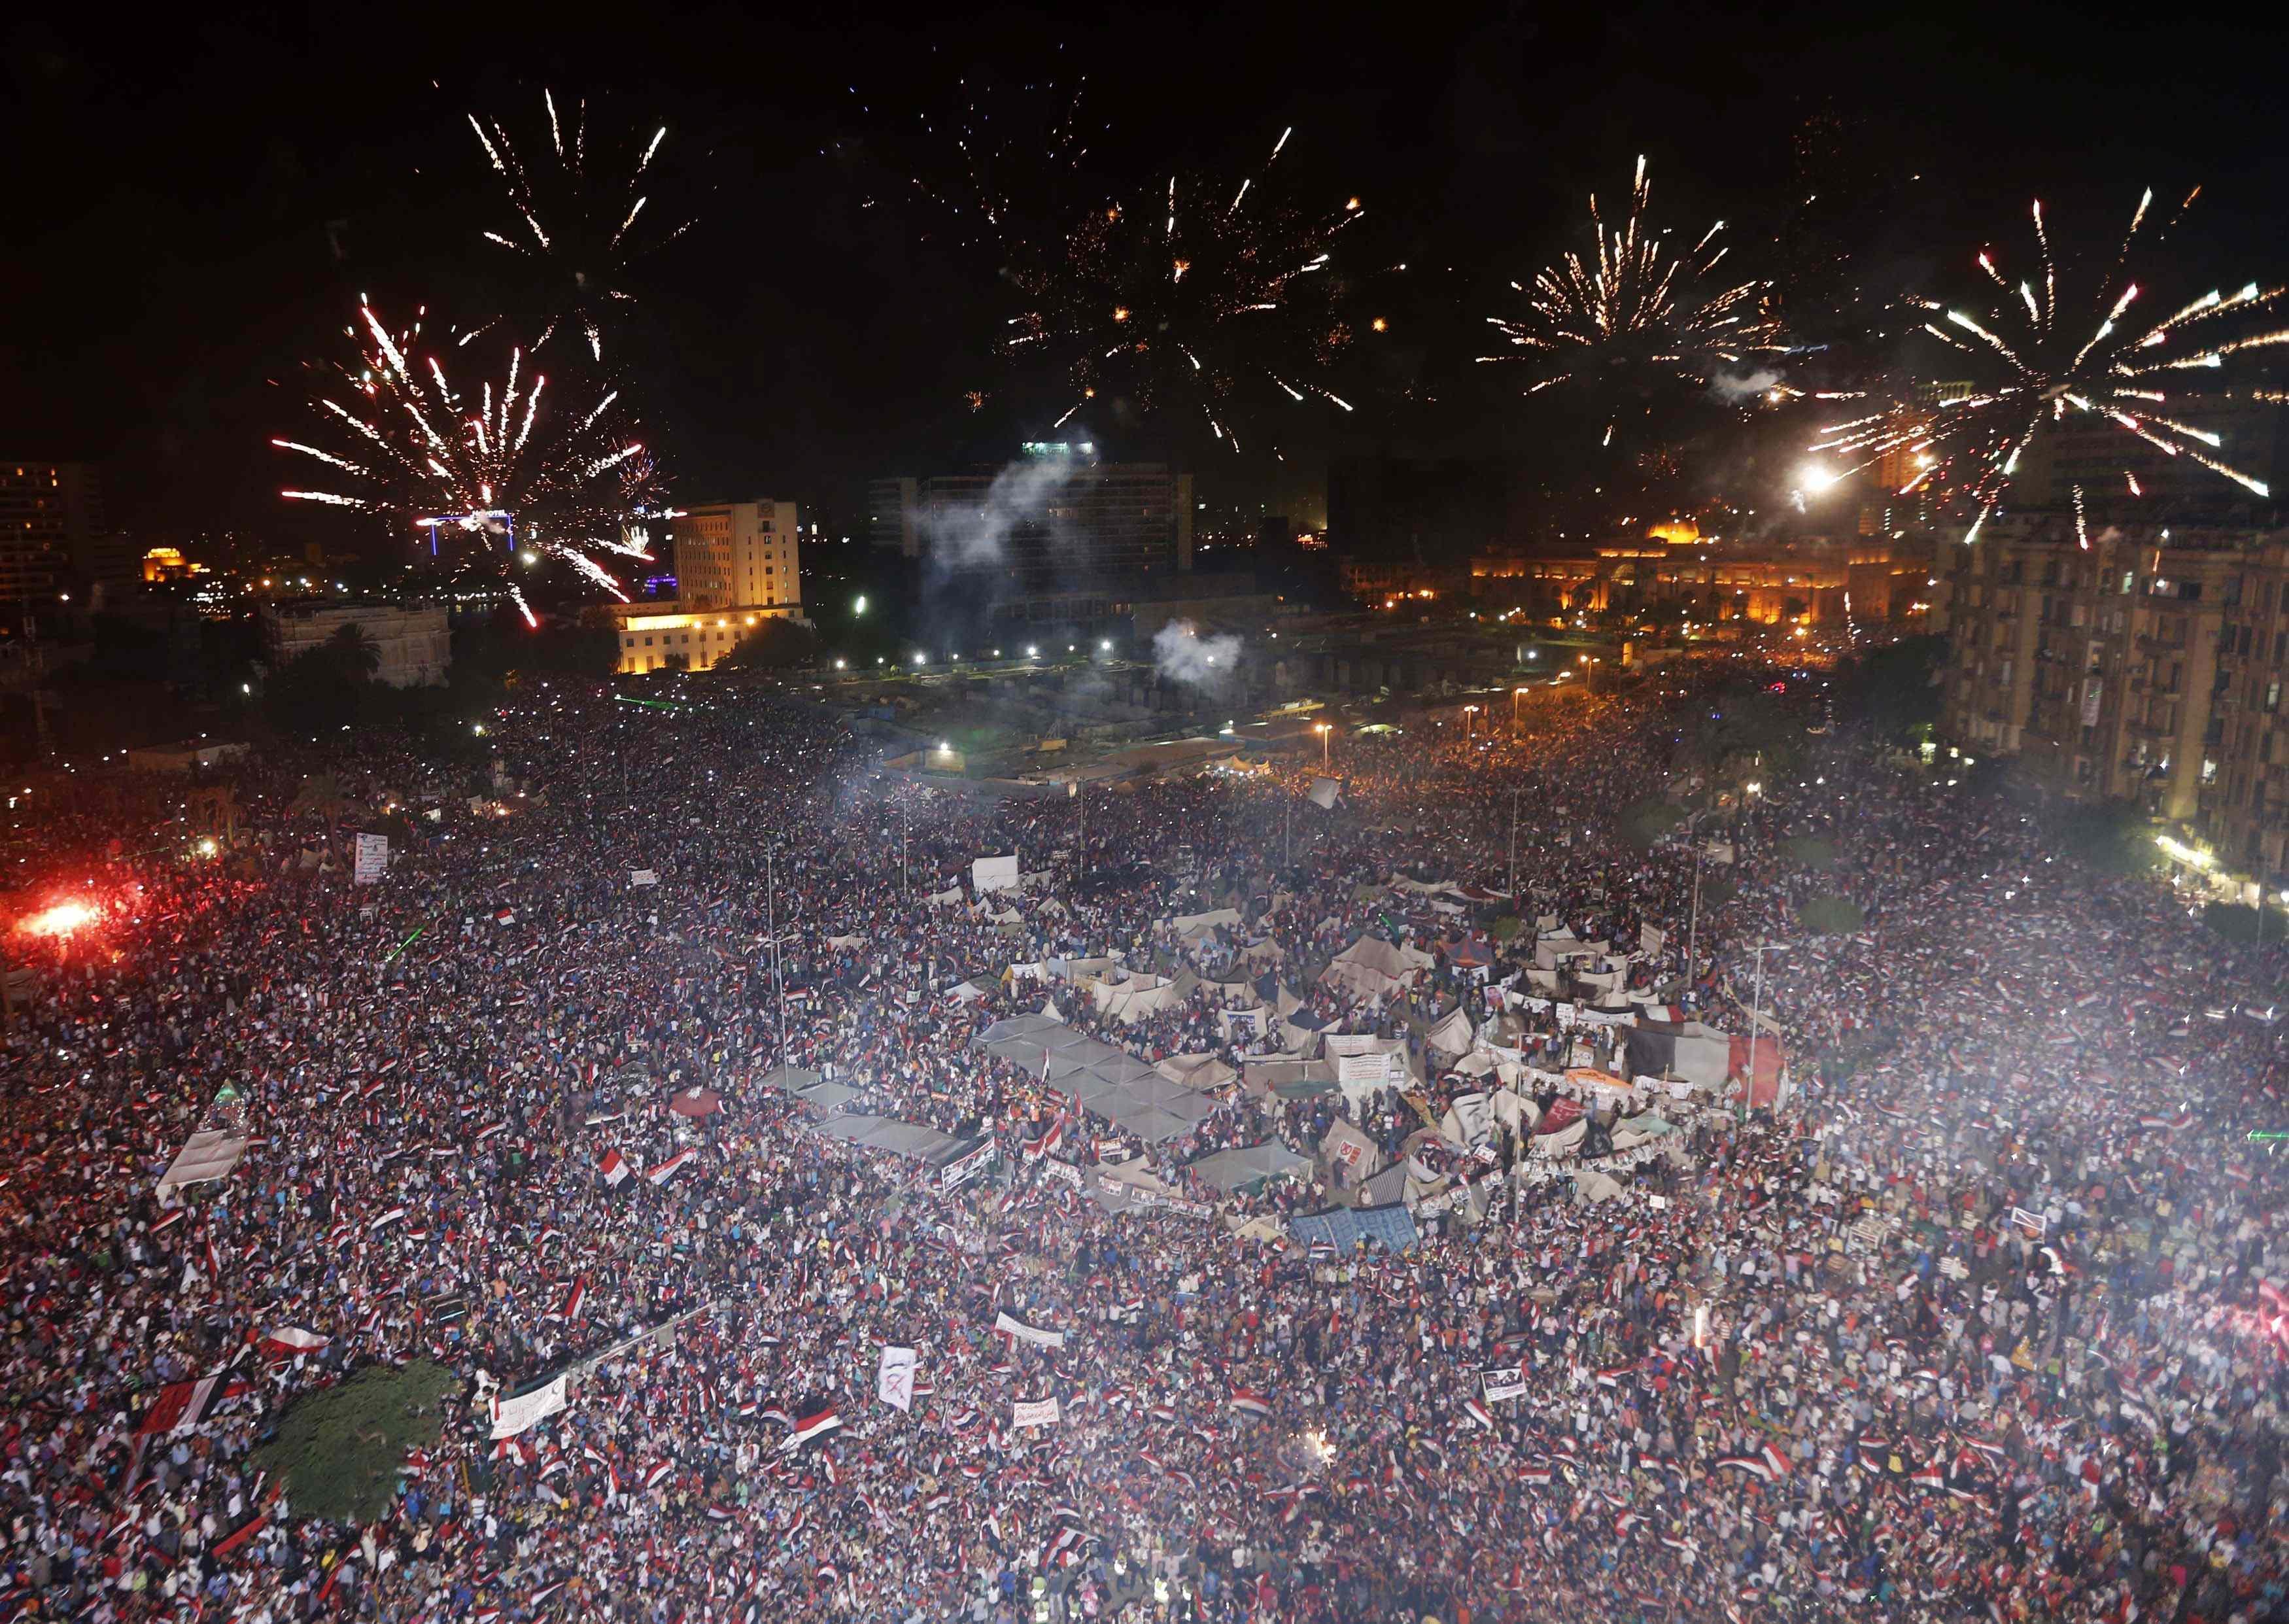 Gallery: Egypt military coup ousts President Mohammed Morsi